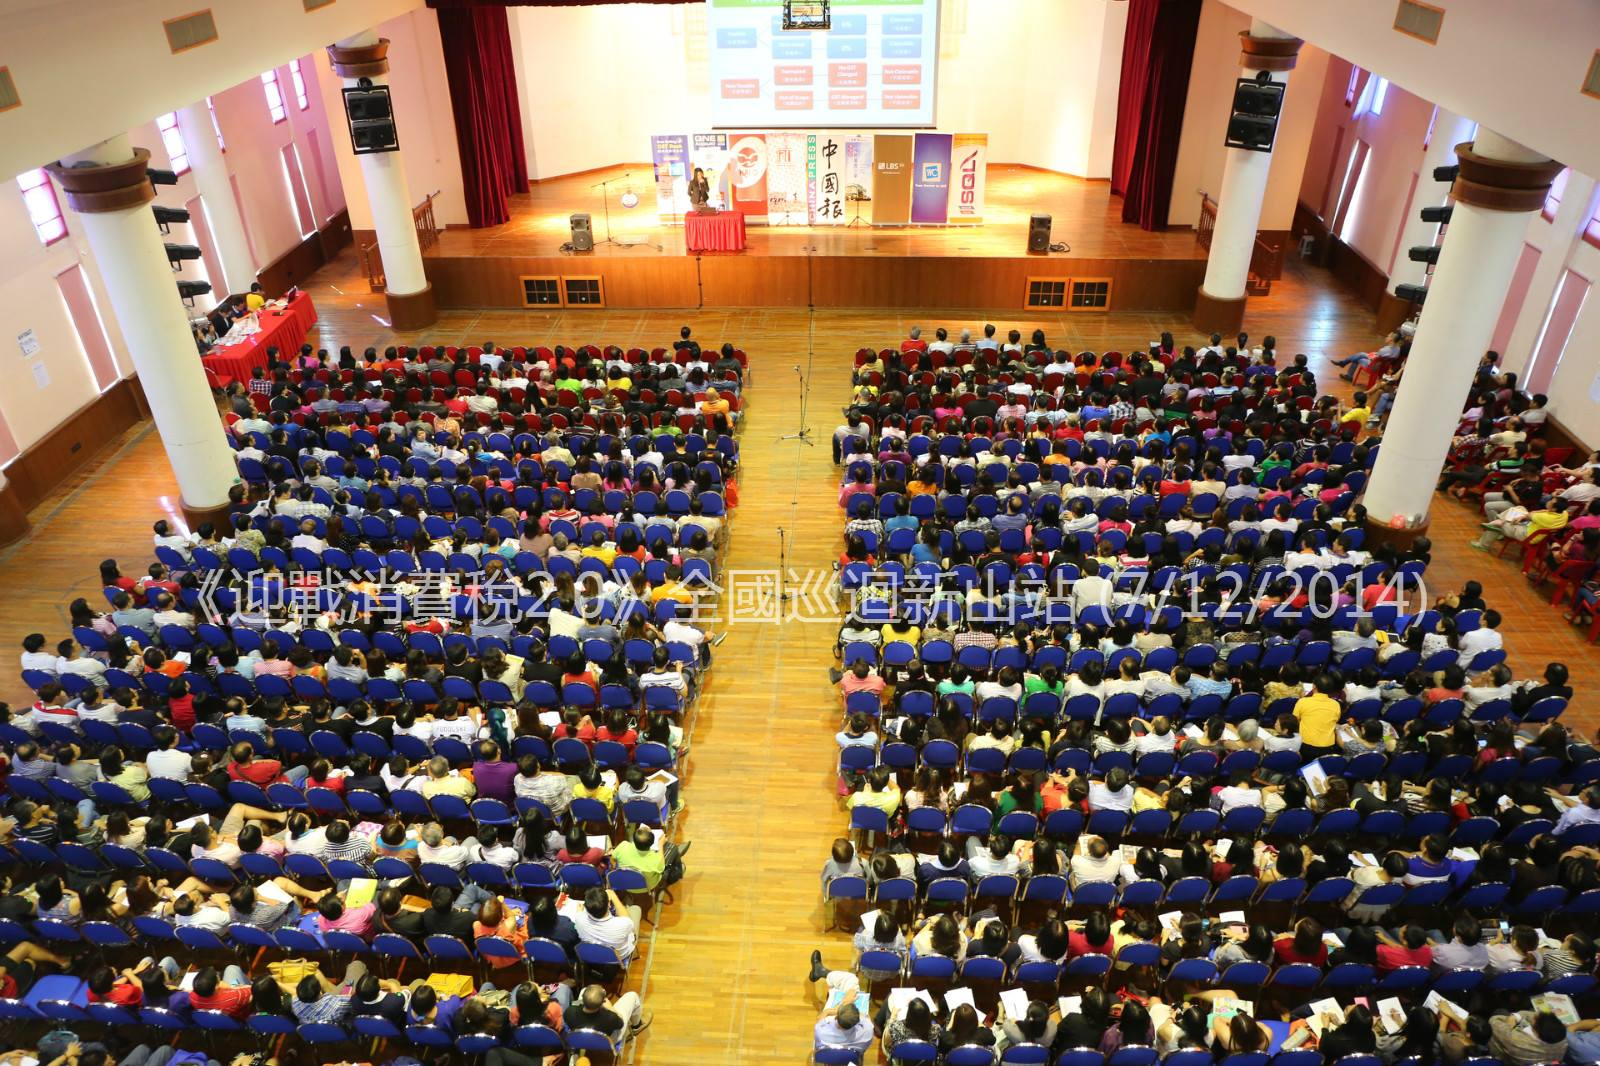 Johor Bharu - 8 December 2014